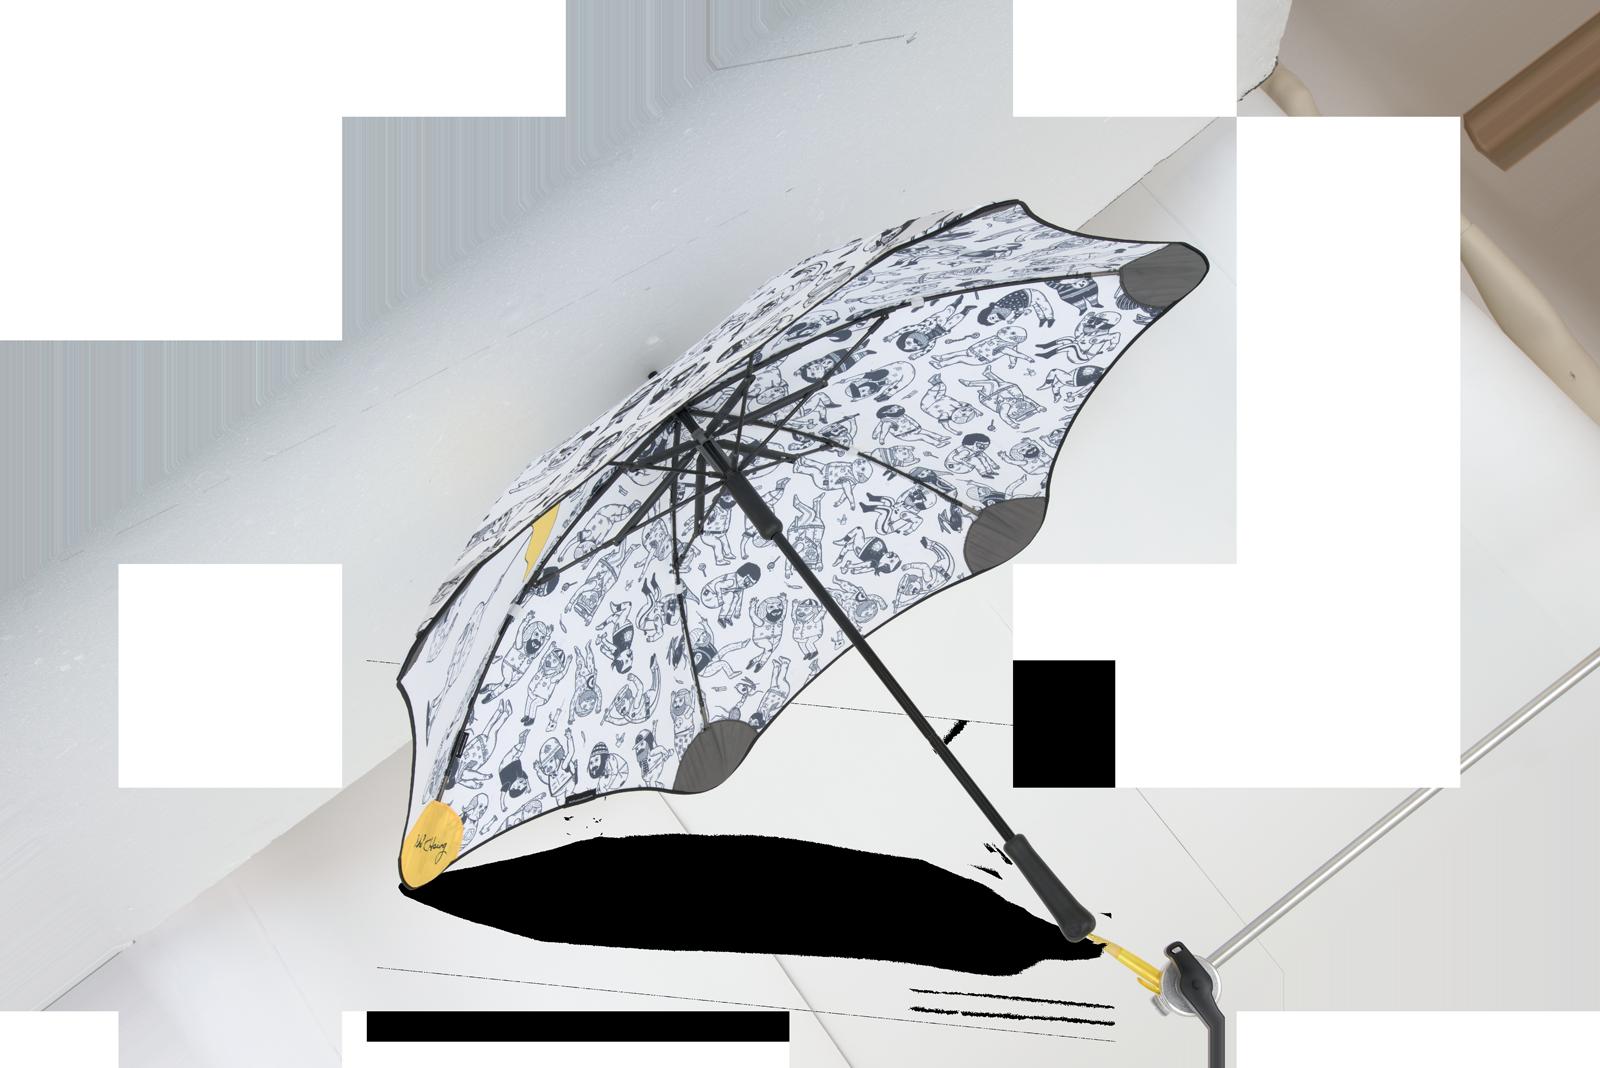 Blunt Umbrellas Uk The World S Best Designed By New Zealand